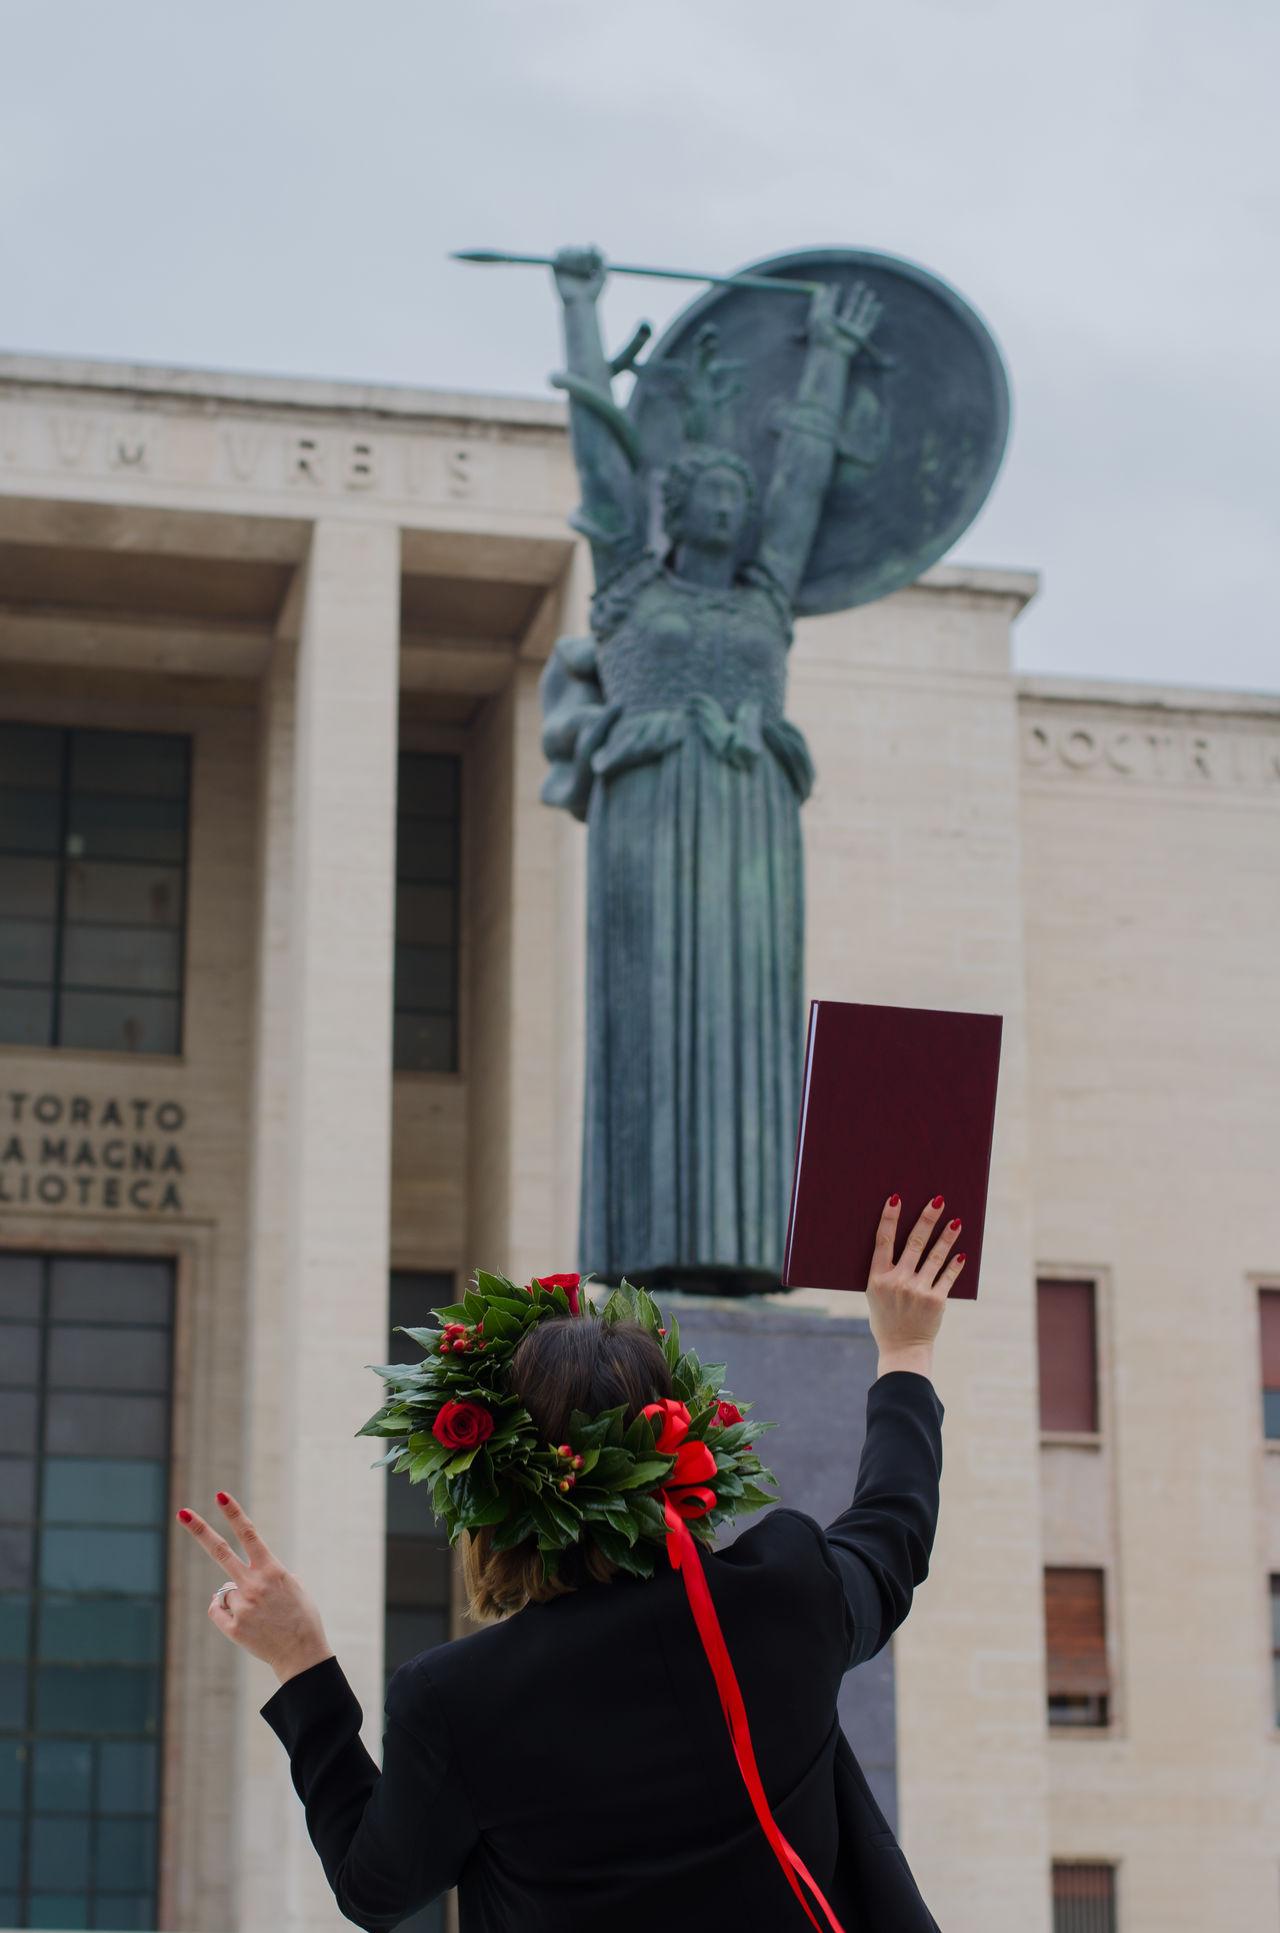 Graduation challenge Challenge Graduation Day M Sapienza Statue Thedimpples Univeristy Women